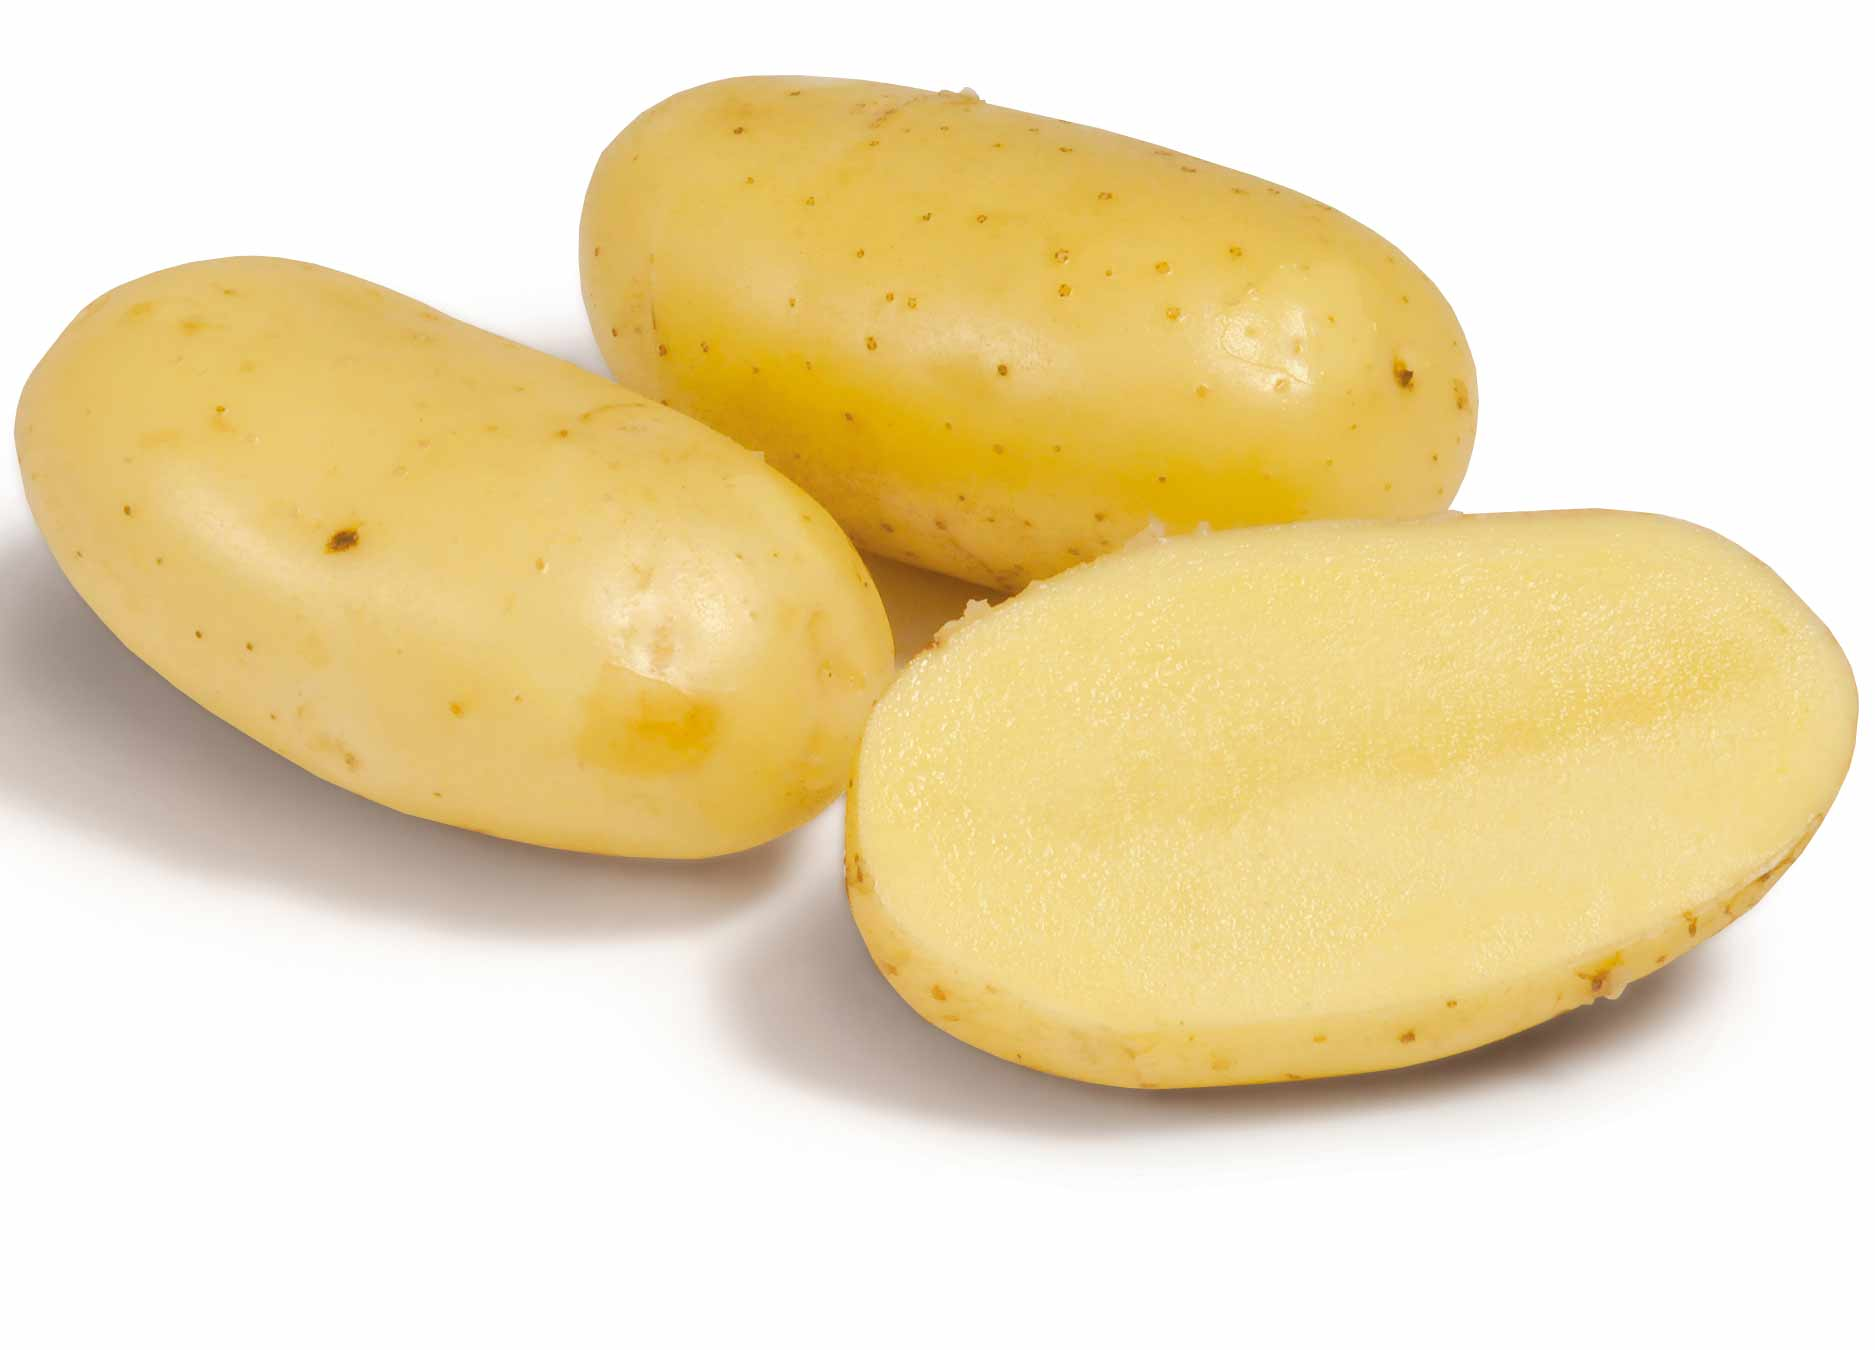 1200029 SOLANUM tuberosum  Siemenperuna Calle (Challinger) 2,5 kg